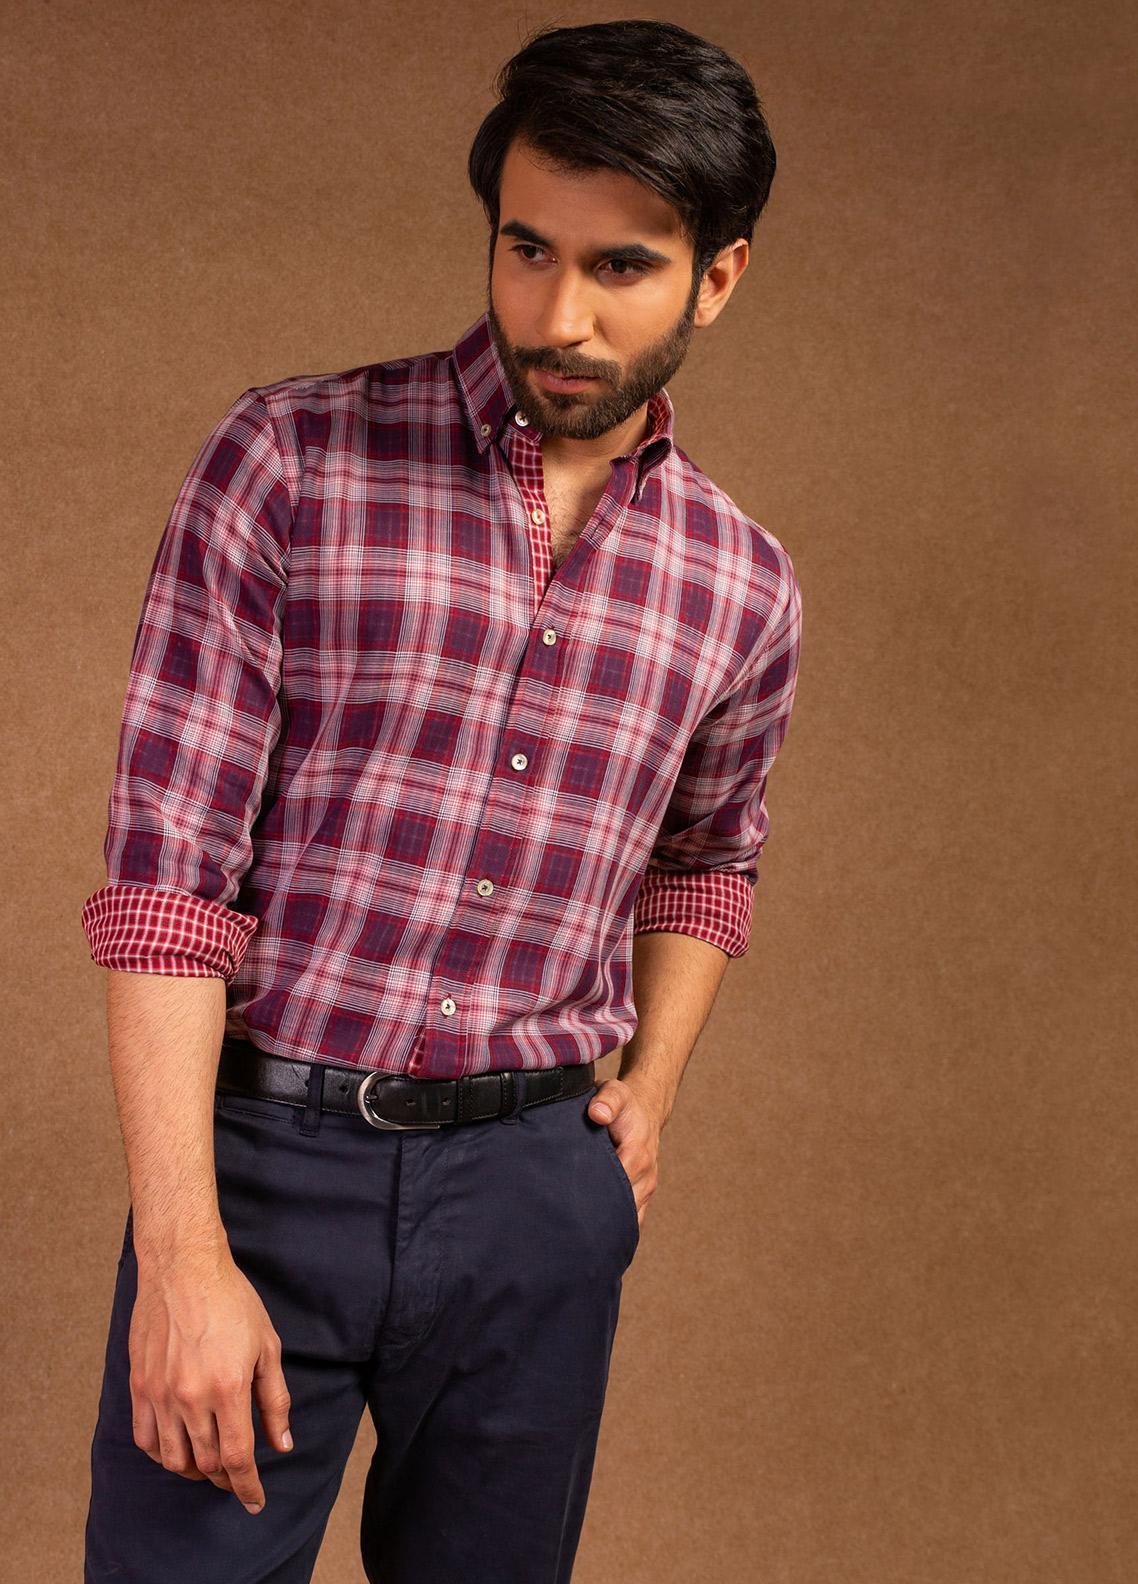 Brumano Cotton Formal Shirts for Men - Purple BRM-581